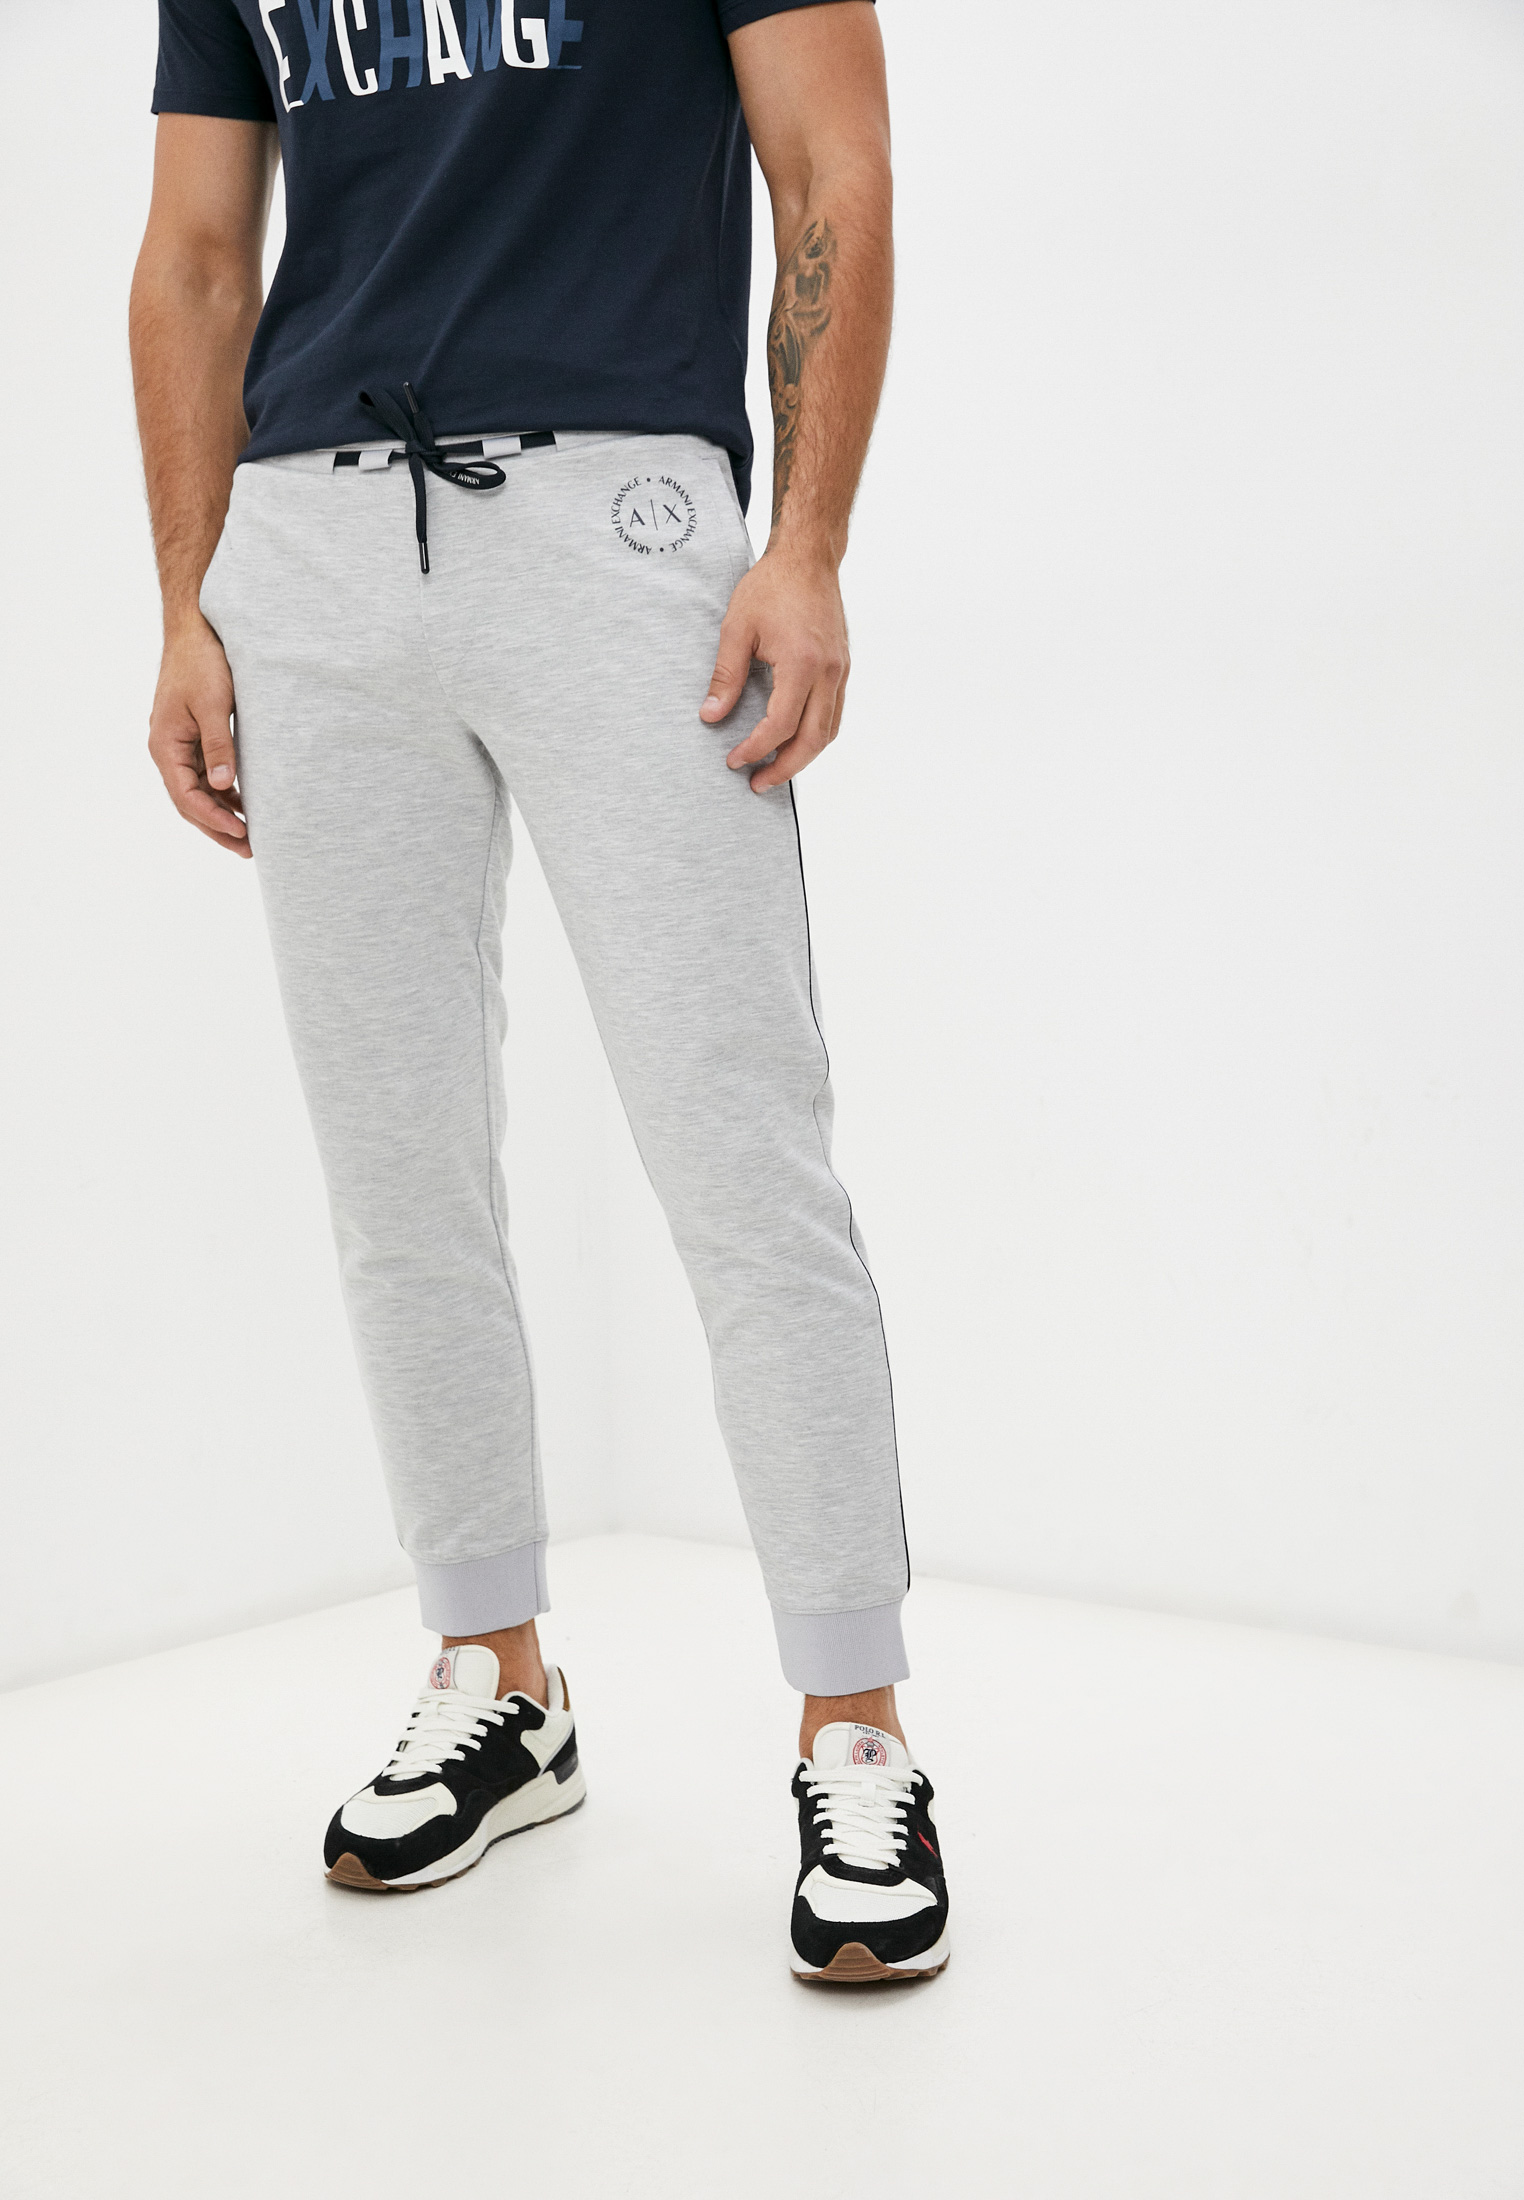 Мужские спортивные брюки Armani Exchange Брюки спортивные Armani Exchange